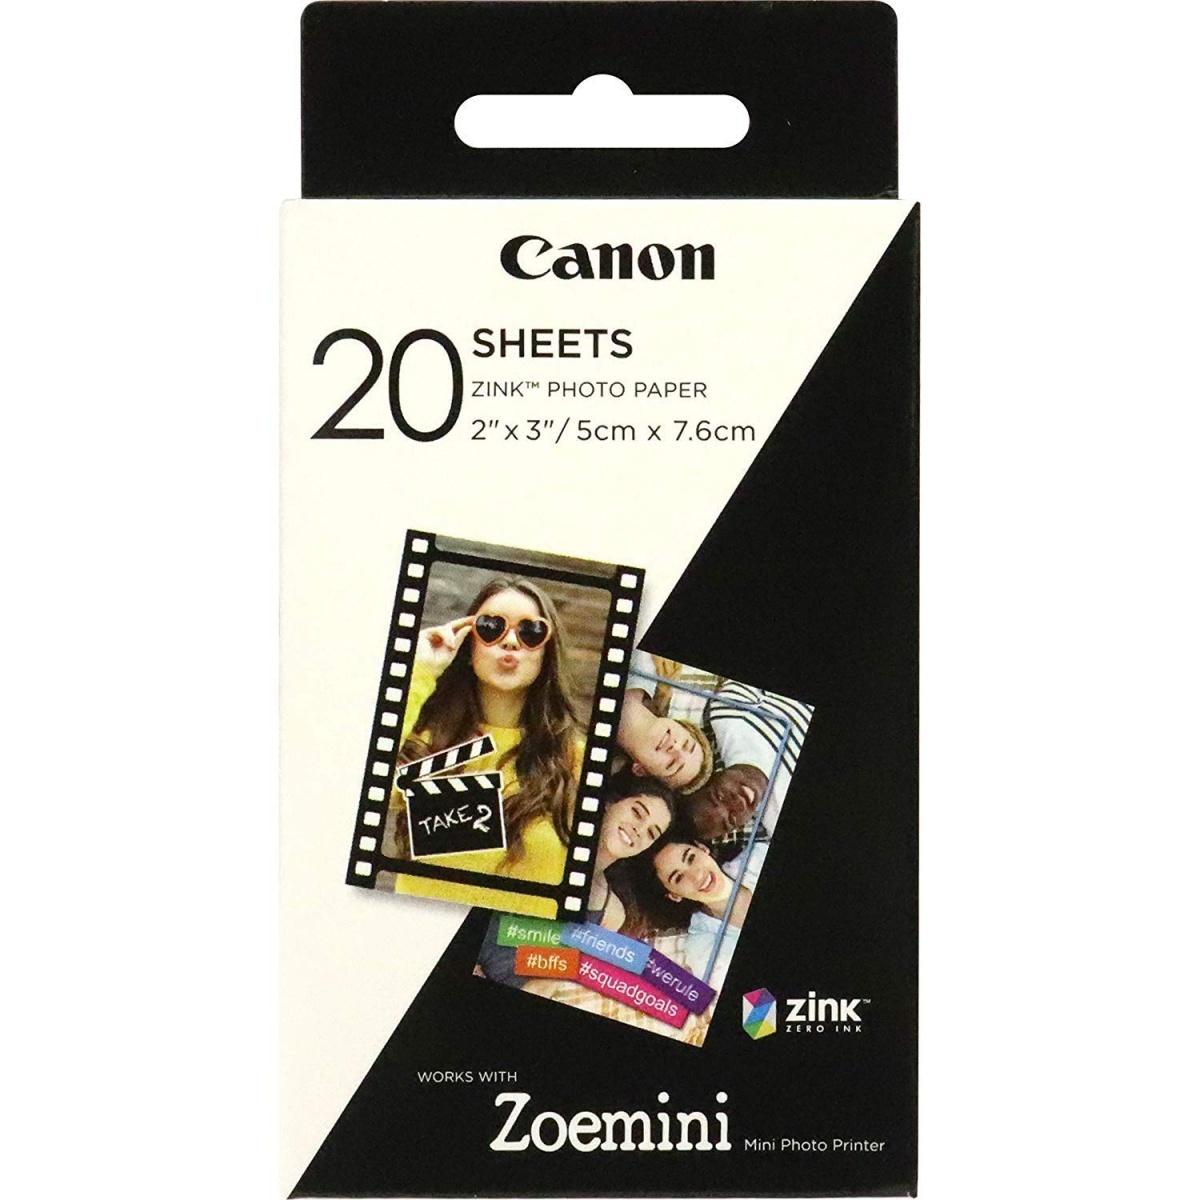 Canon ZP 2030 Zinkpapier 20er Zoemini Fotodrucker